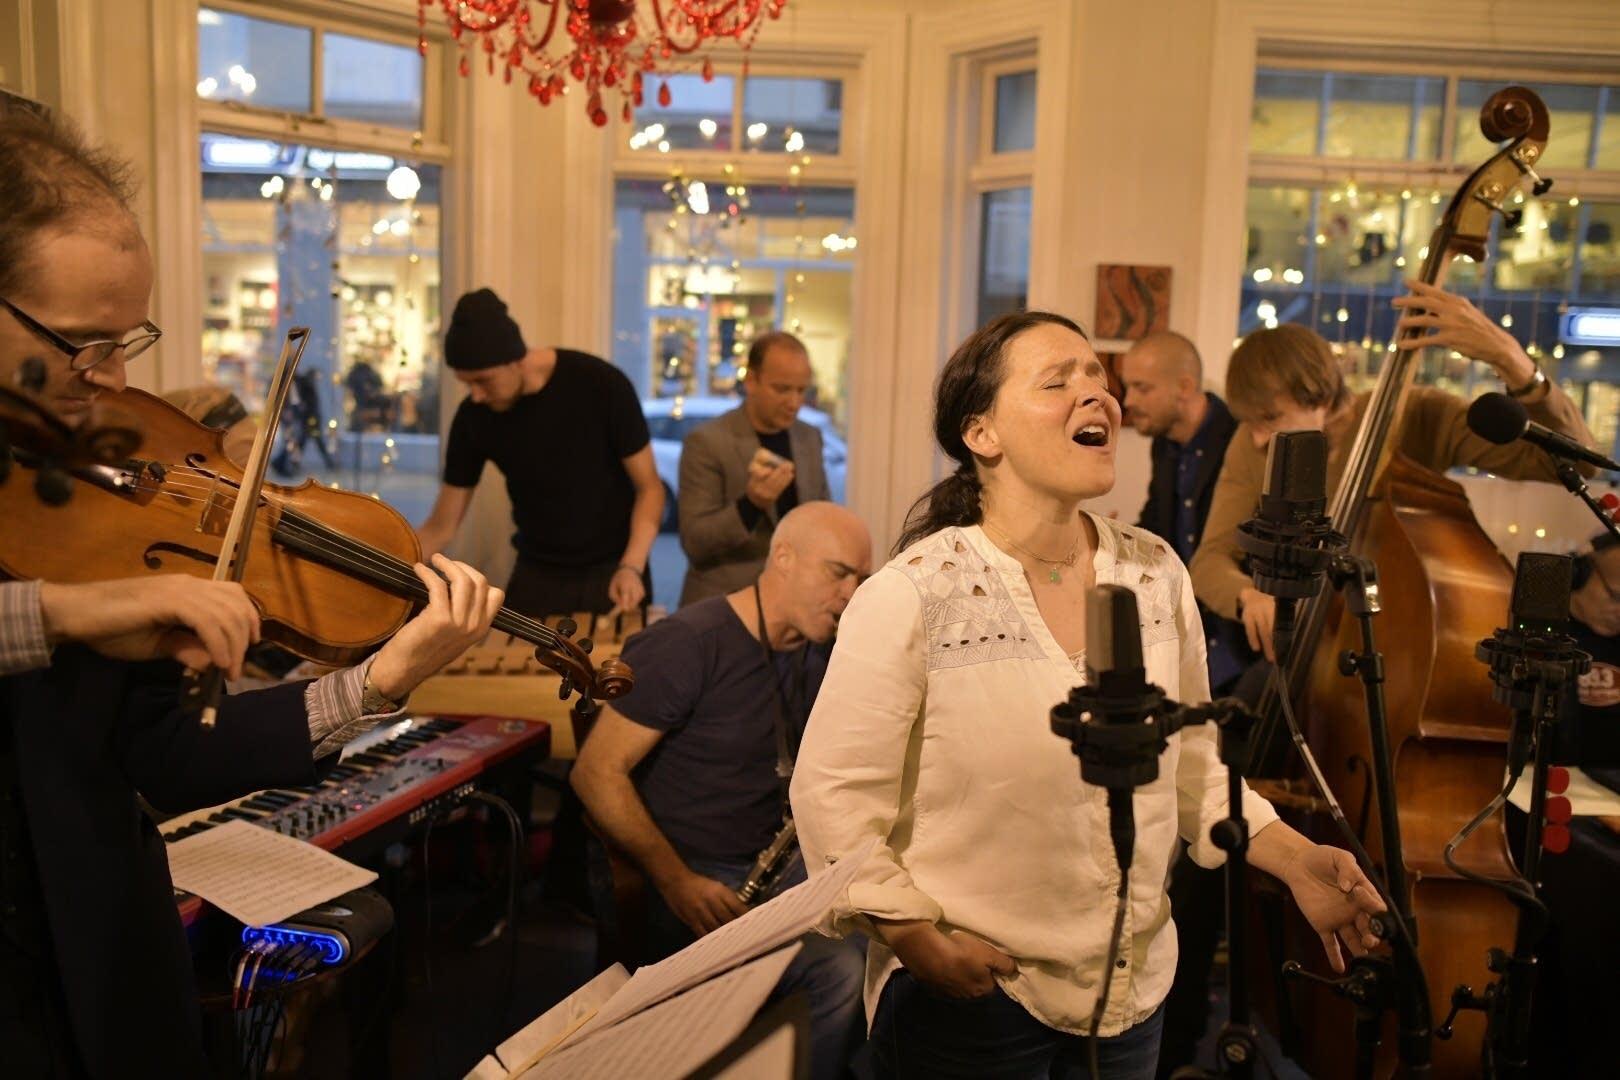 Emiliani Torrini and the Colorist perform in Akureyri, Iceland